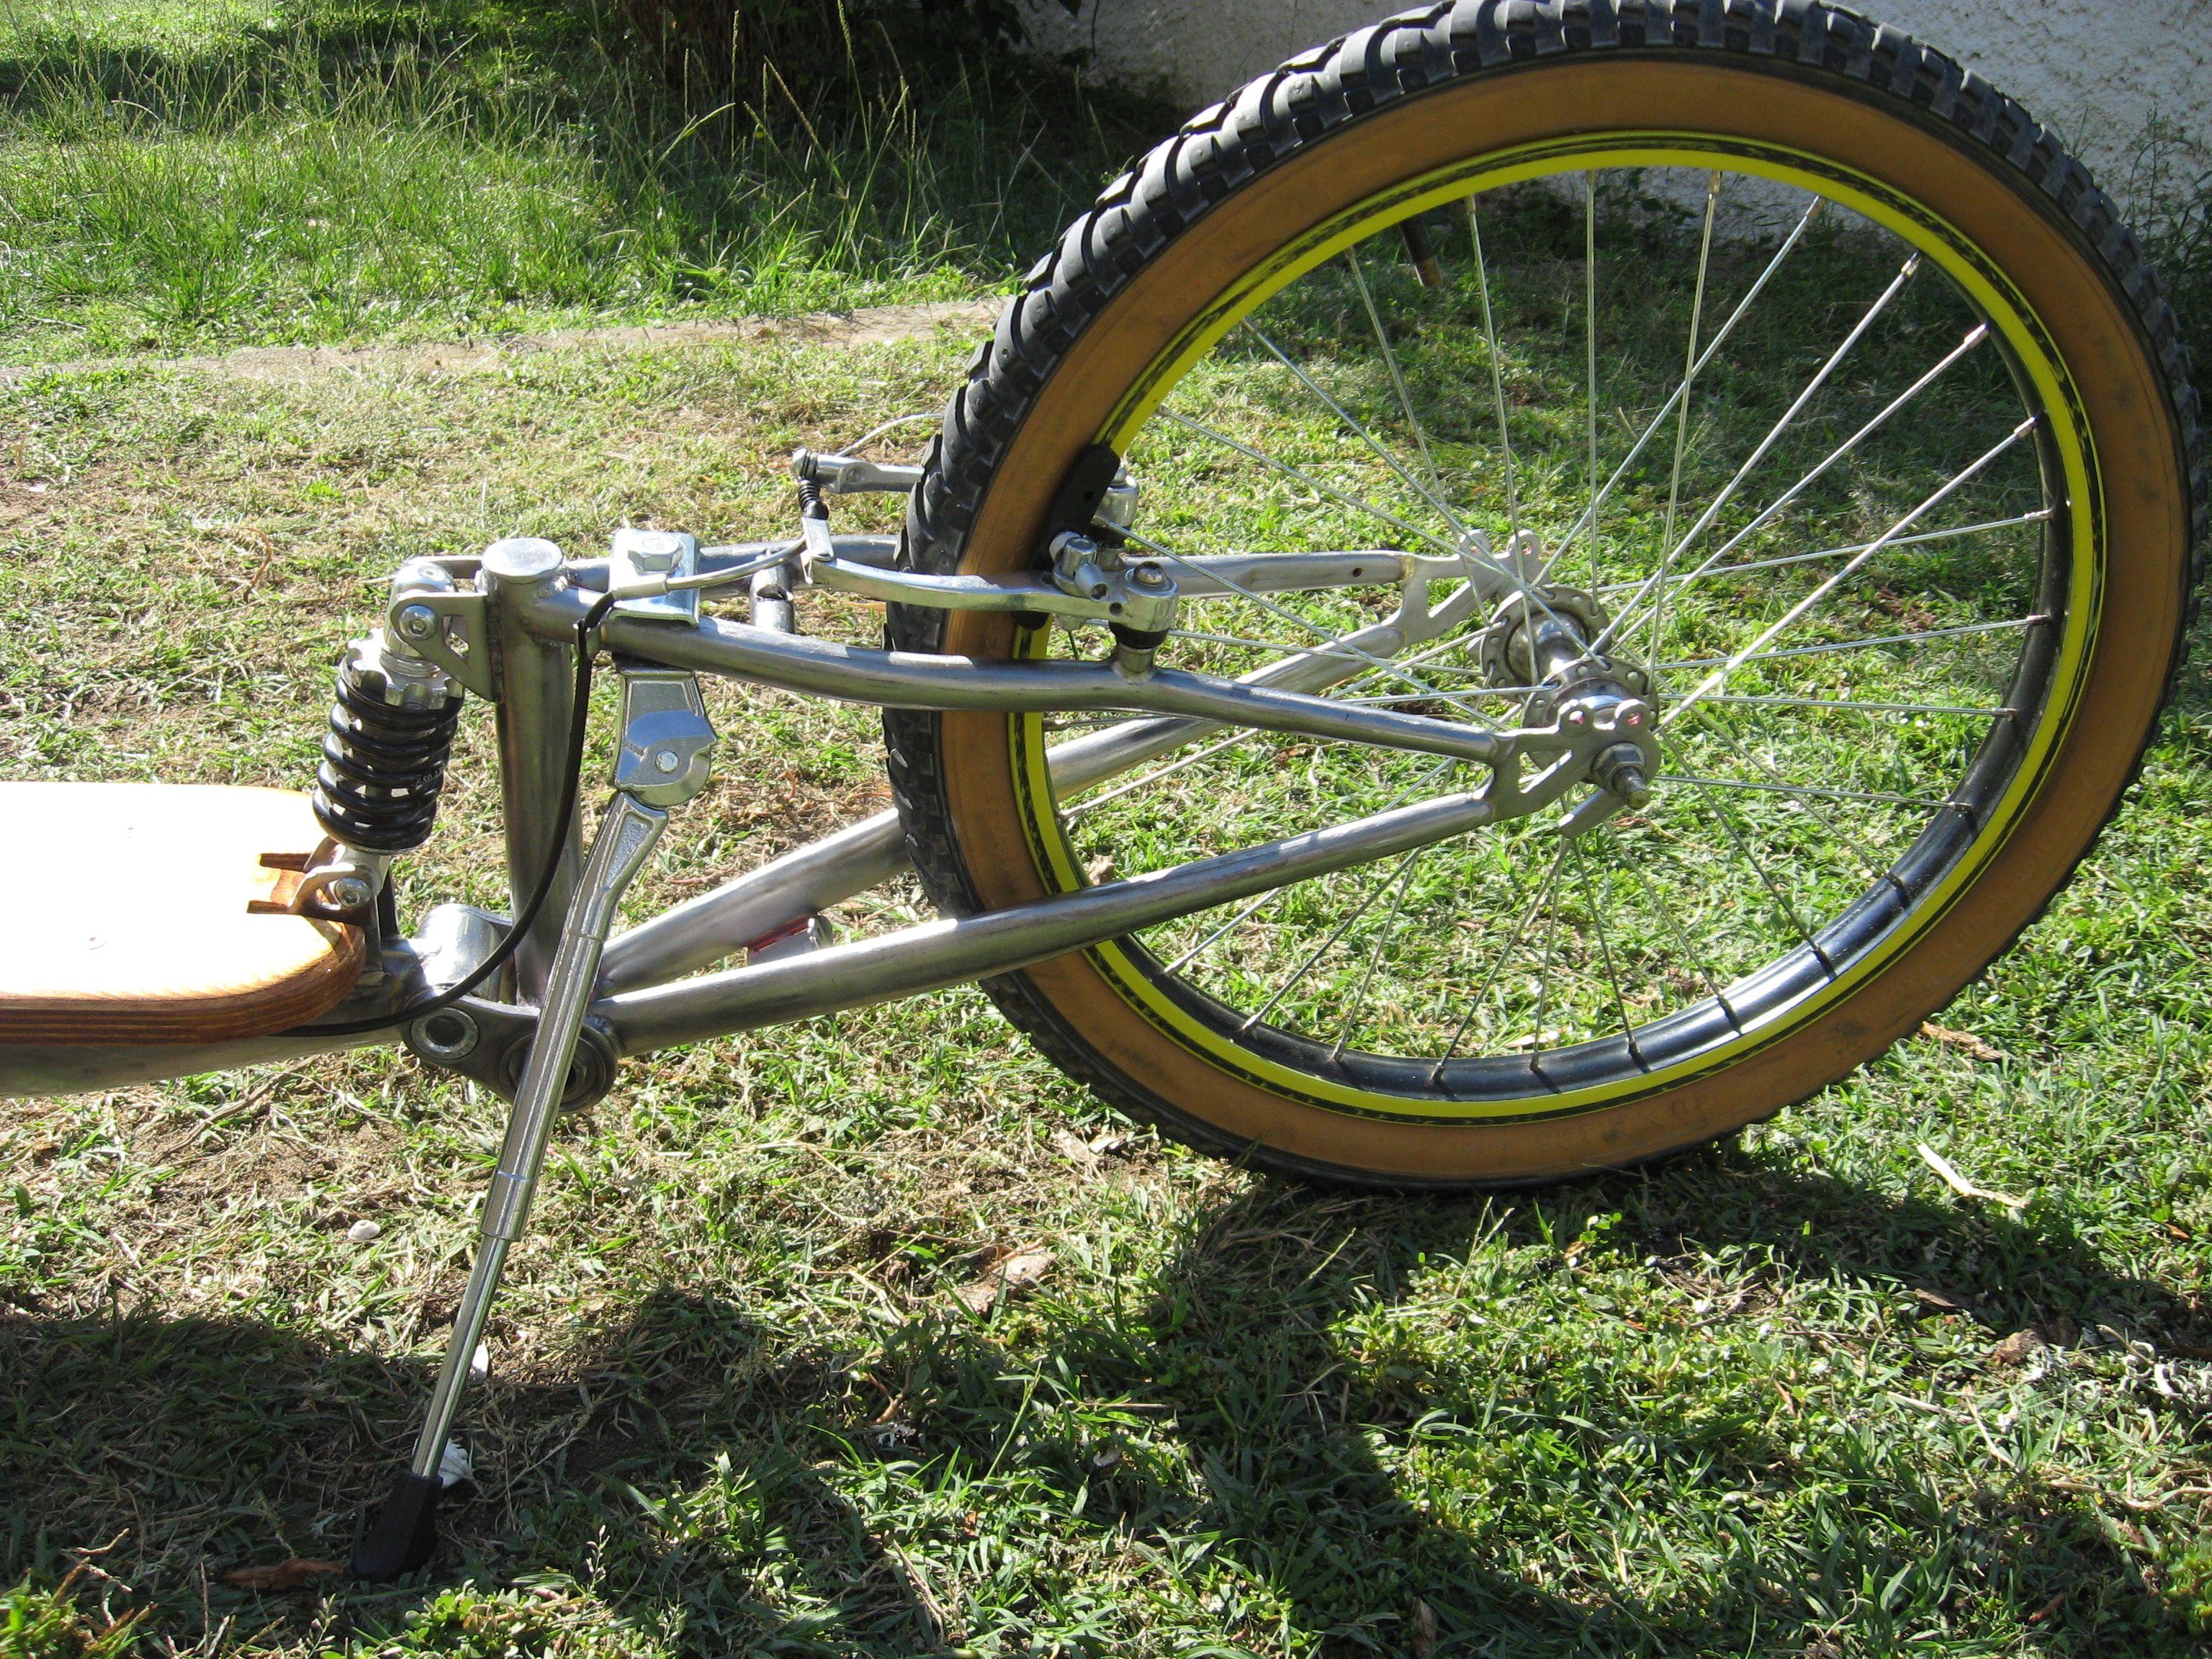 Footbike Suspension